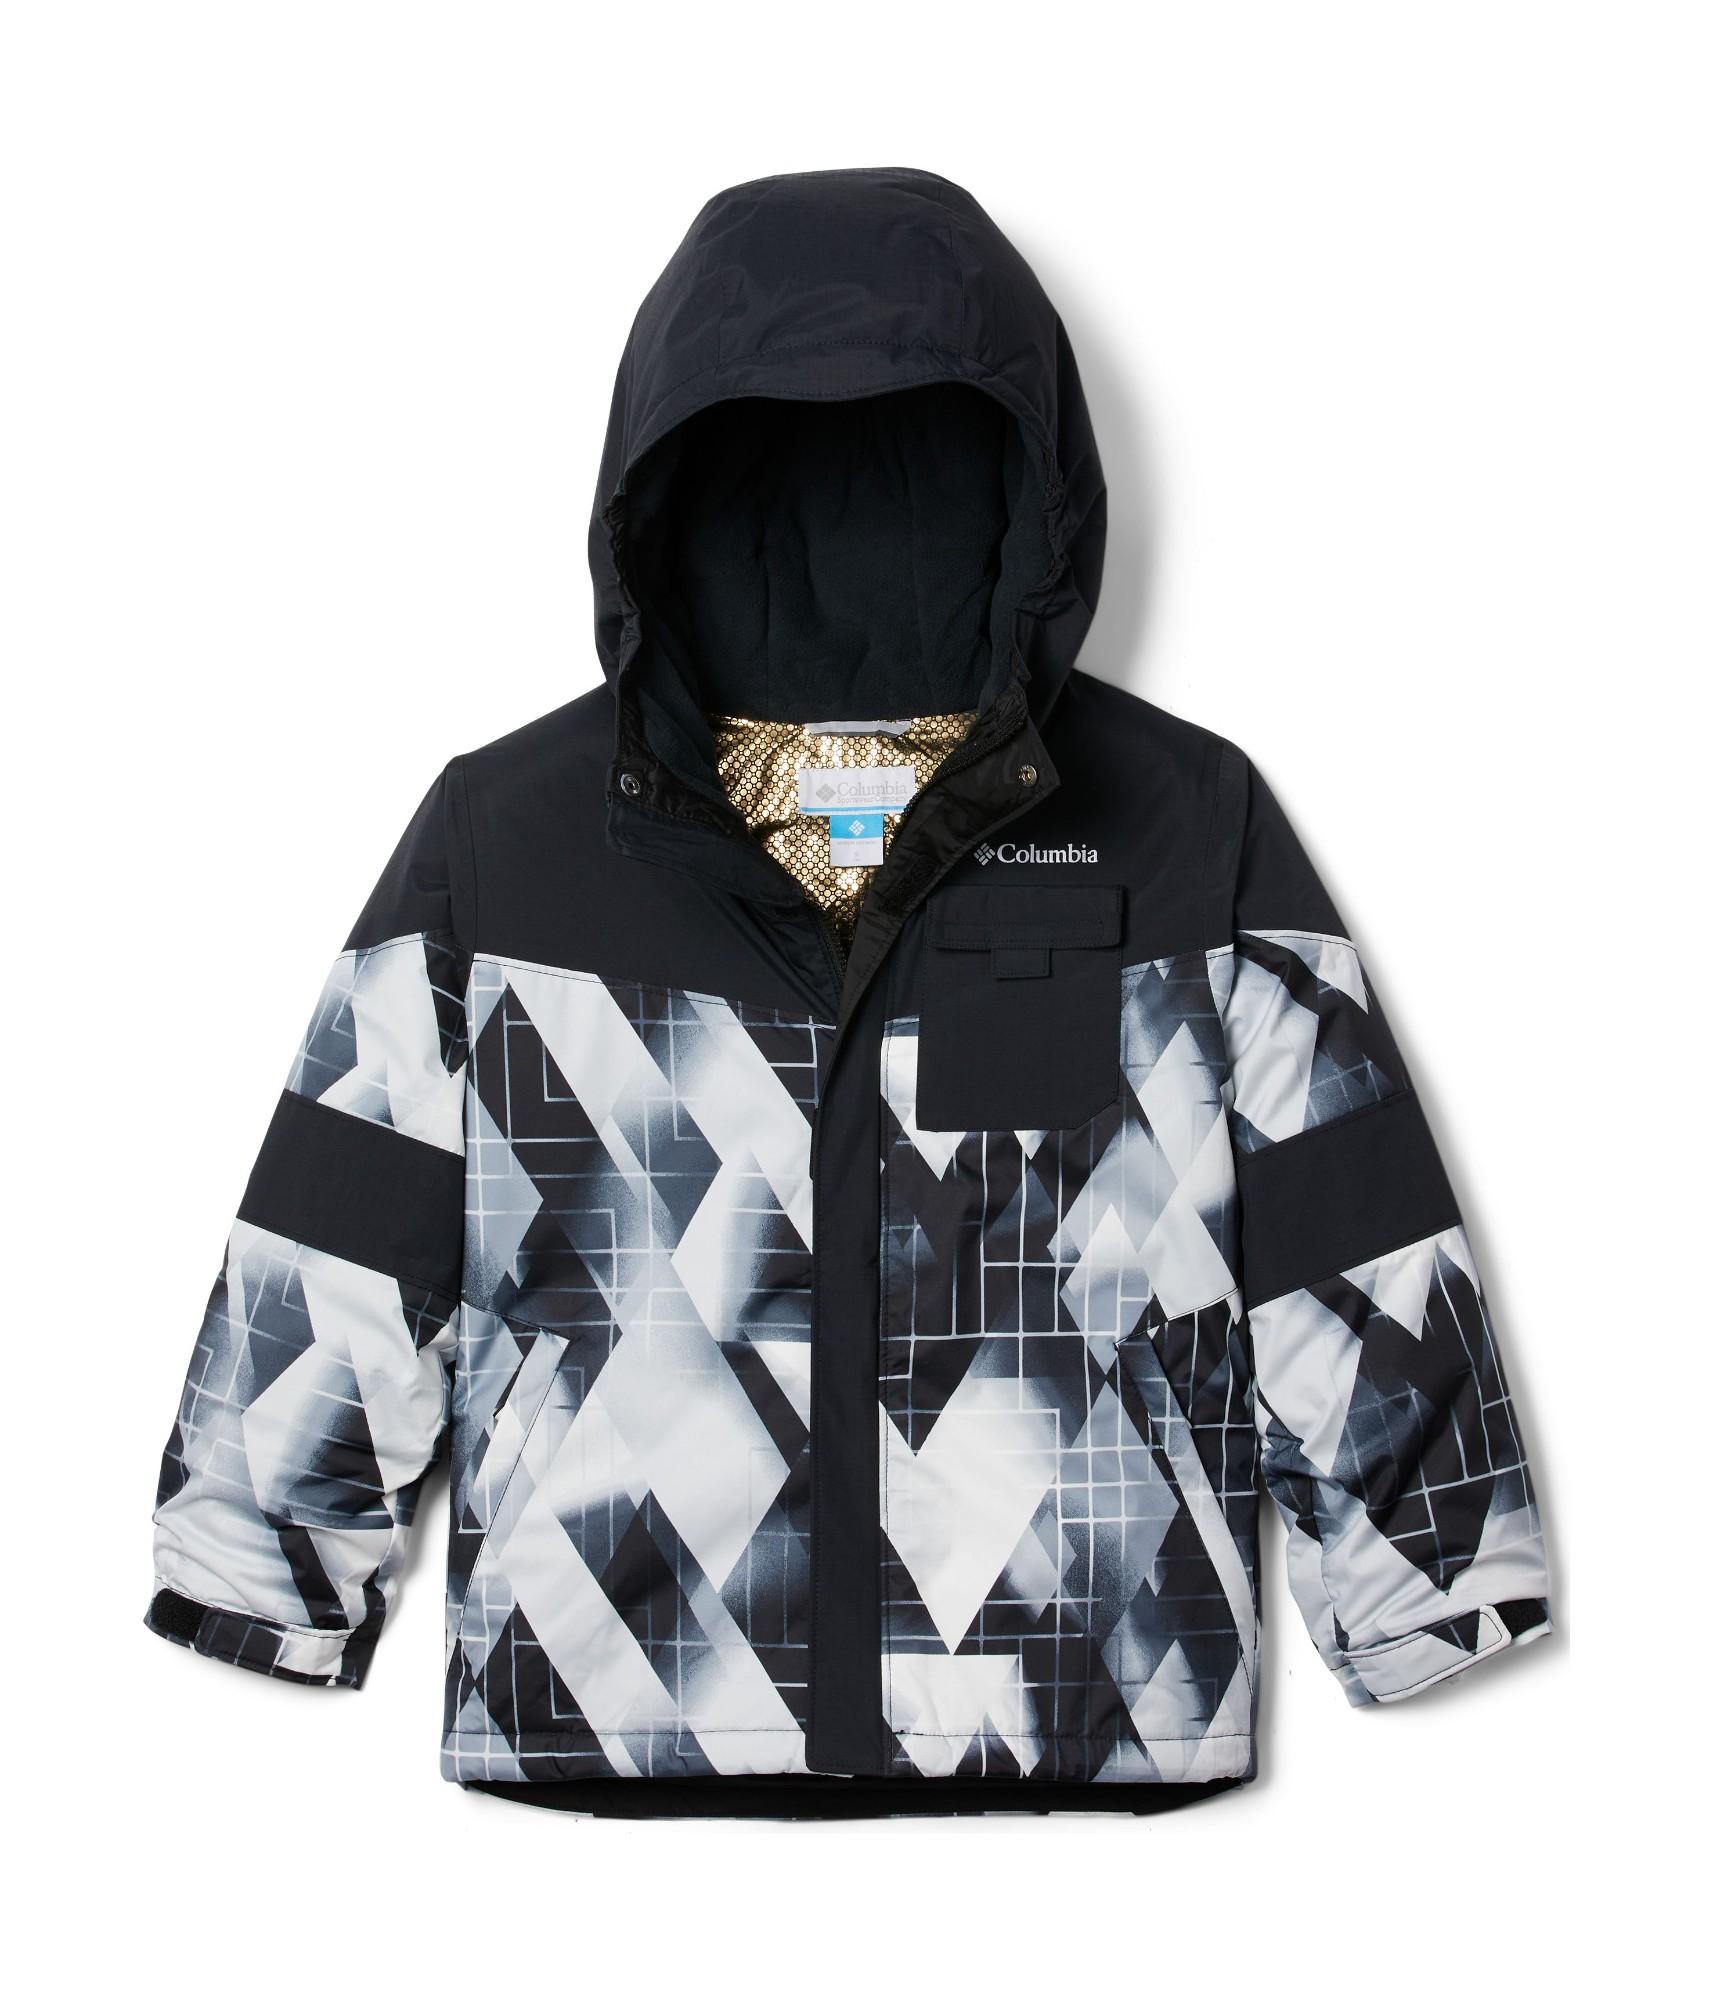 Columbia Mighty MogulII Jacket Boy's Black Geo Mt/Black 128